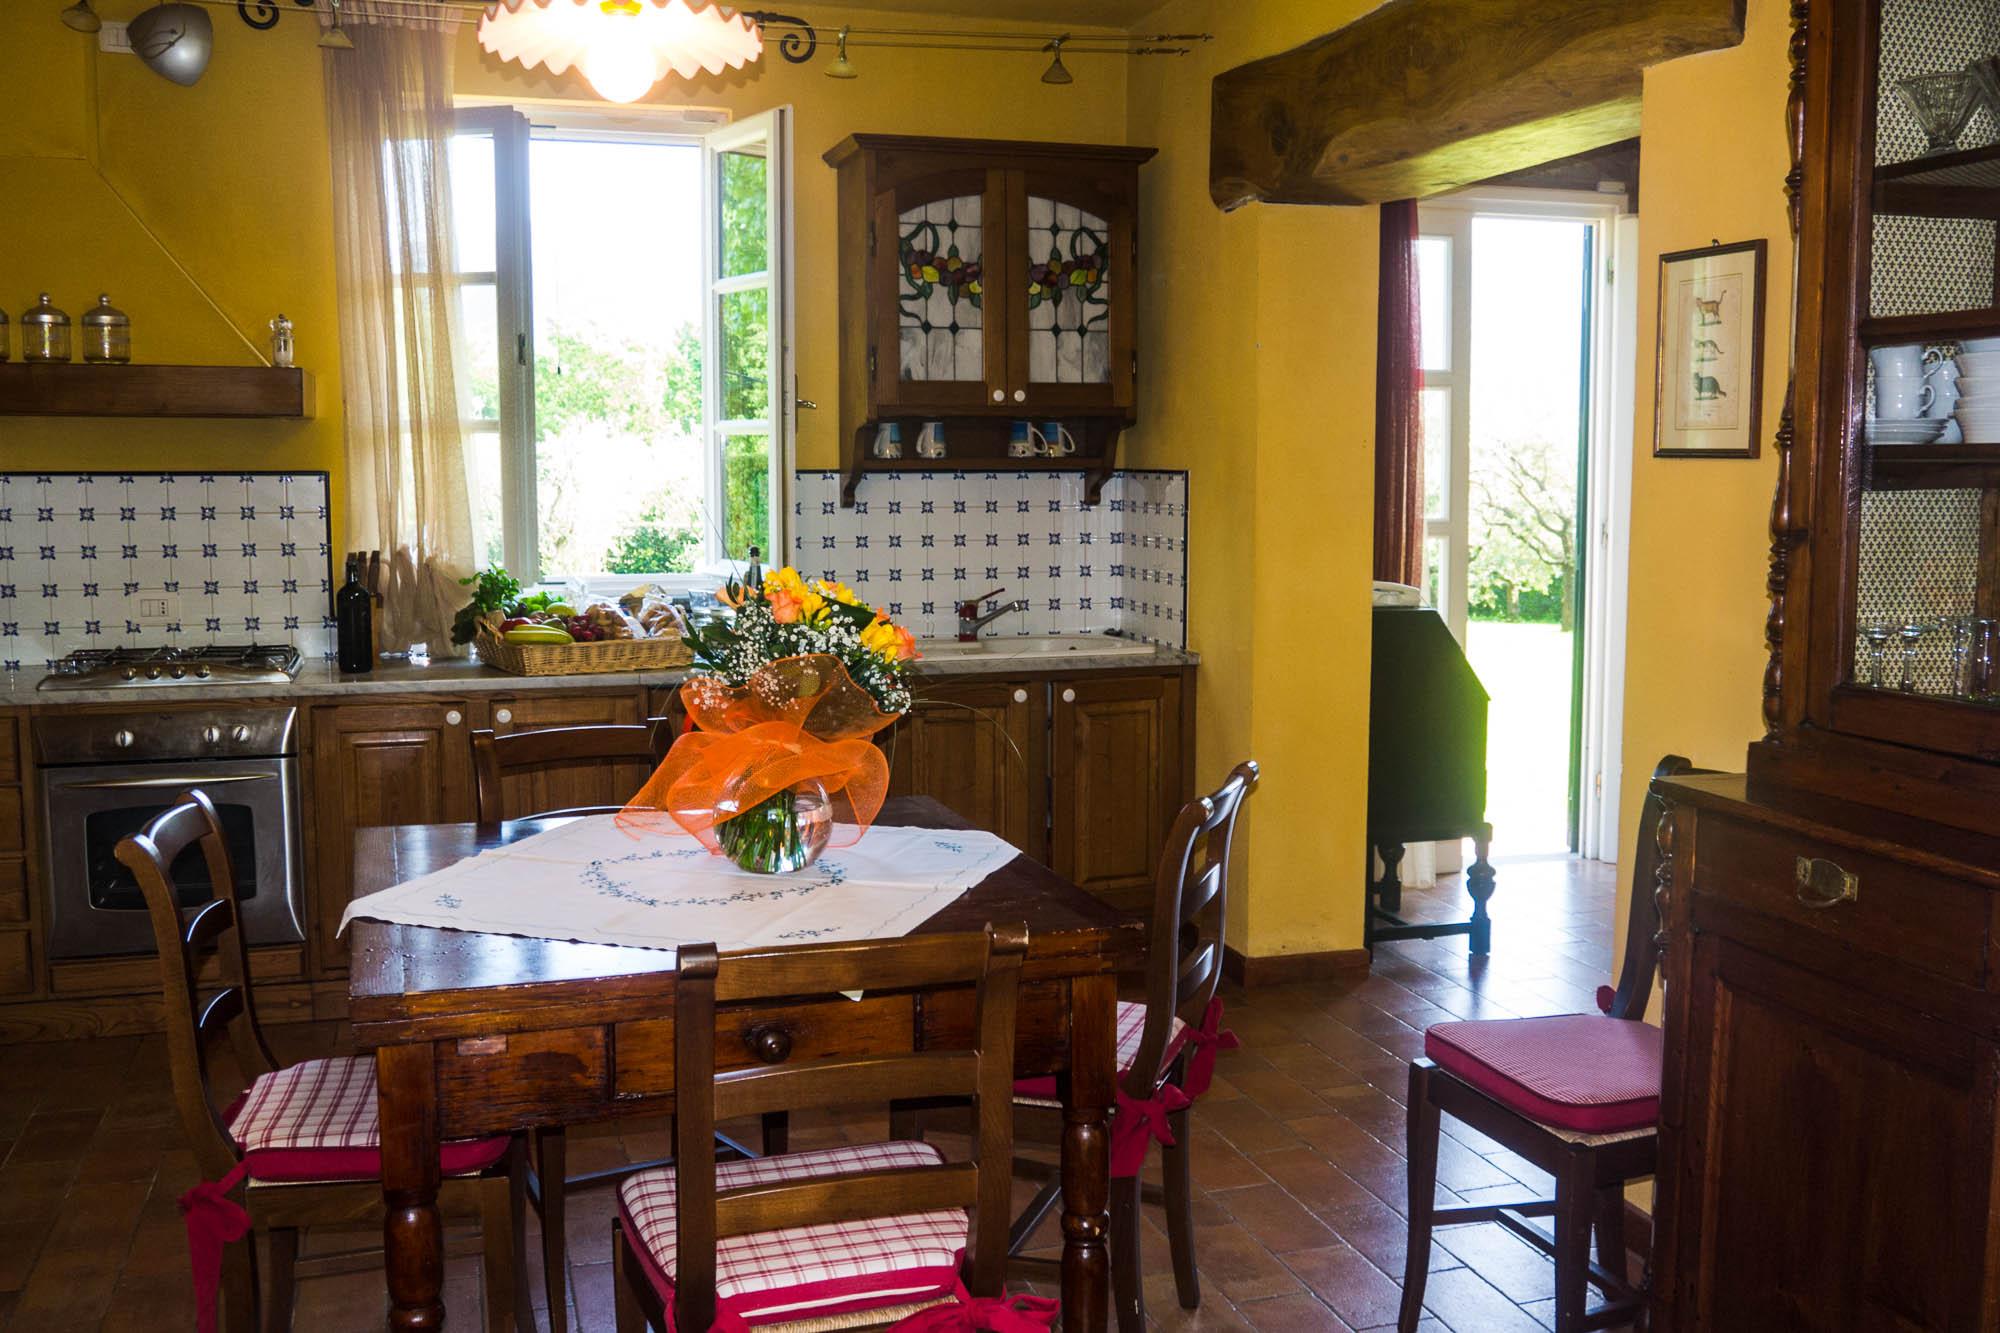 ... Kleines Ferienhaus Toskana   Treppe In Das Obergeschoss ...